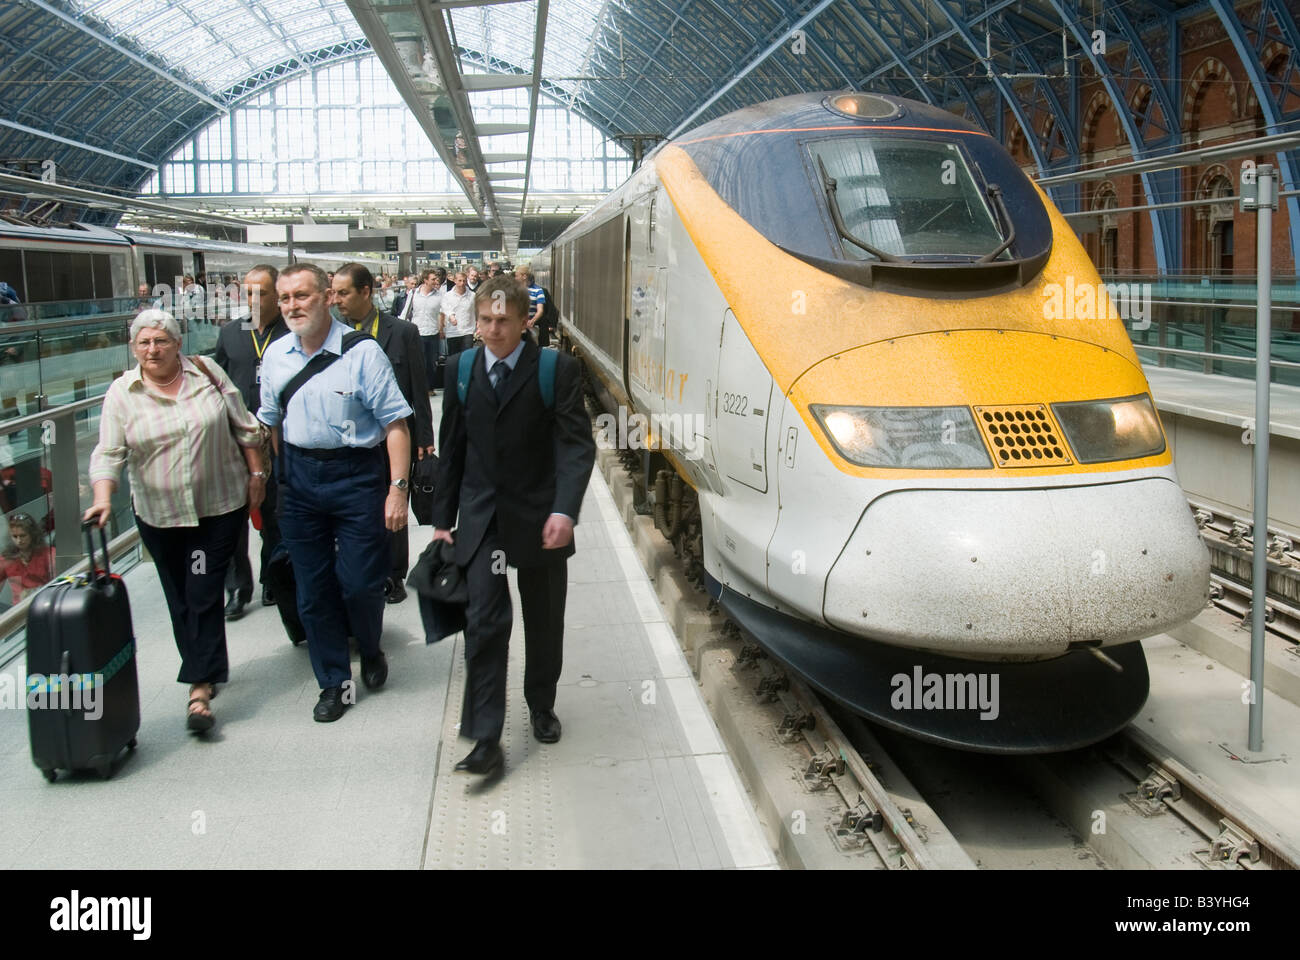 Passengers disembarking from the Eurostar train service at St Pancras International Railway Station England - Stock Image